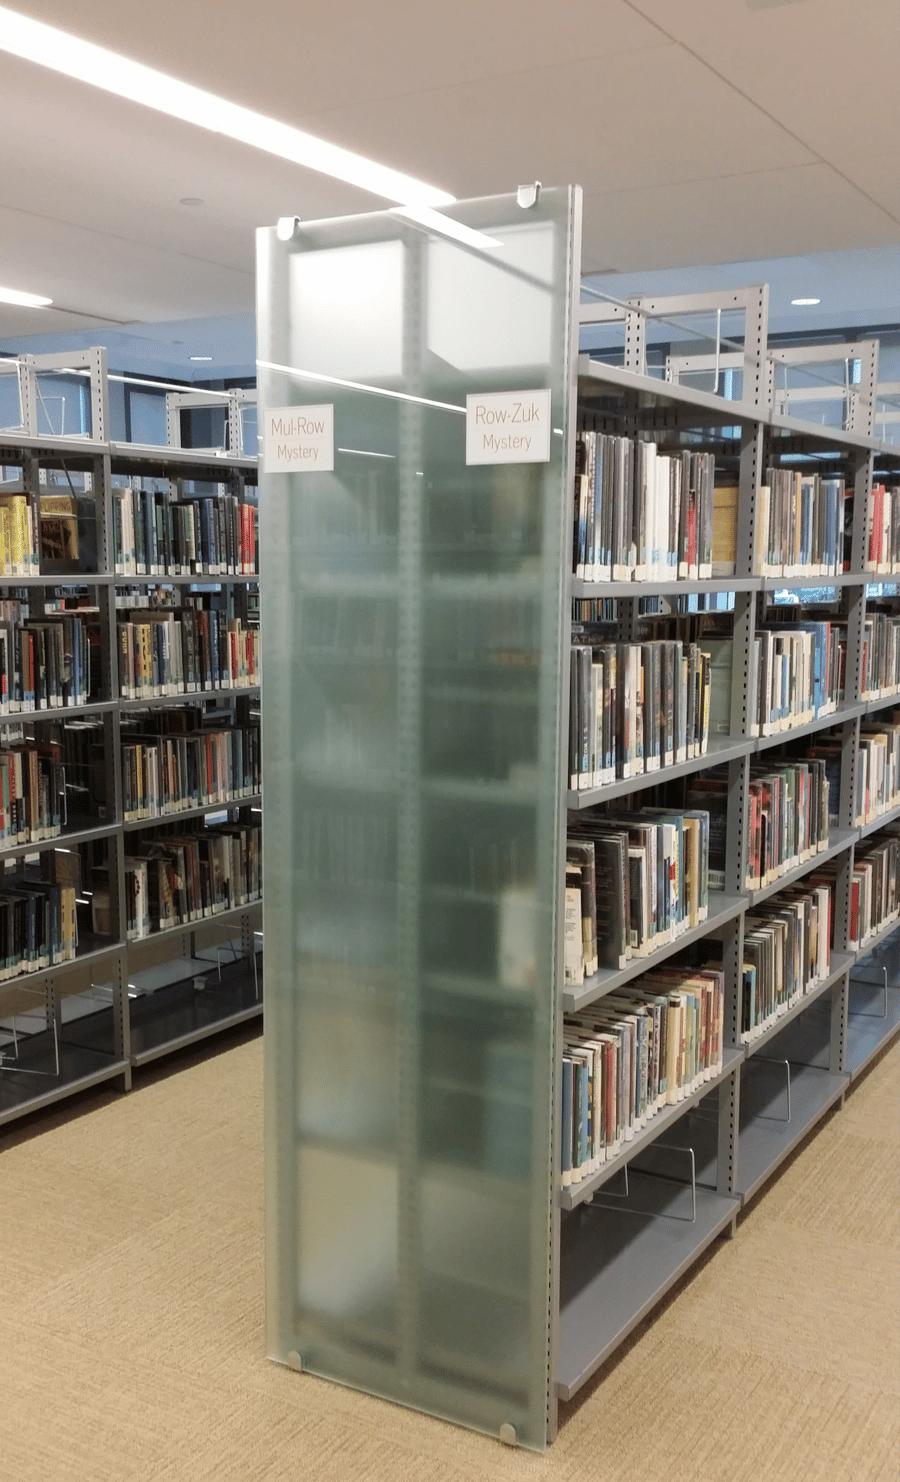 Ridgefield Public Library